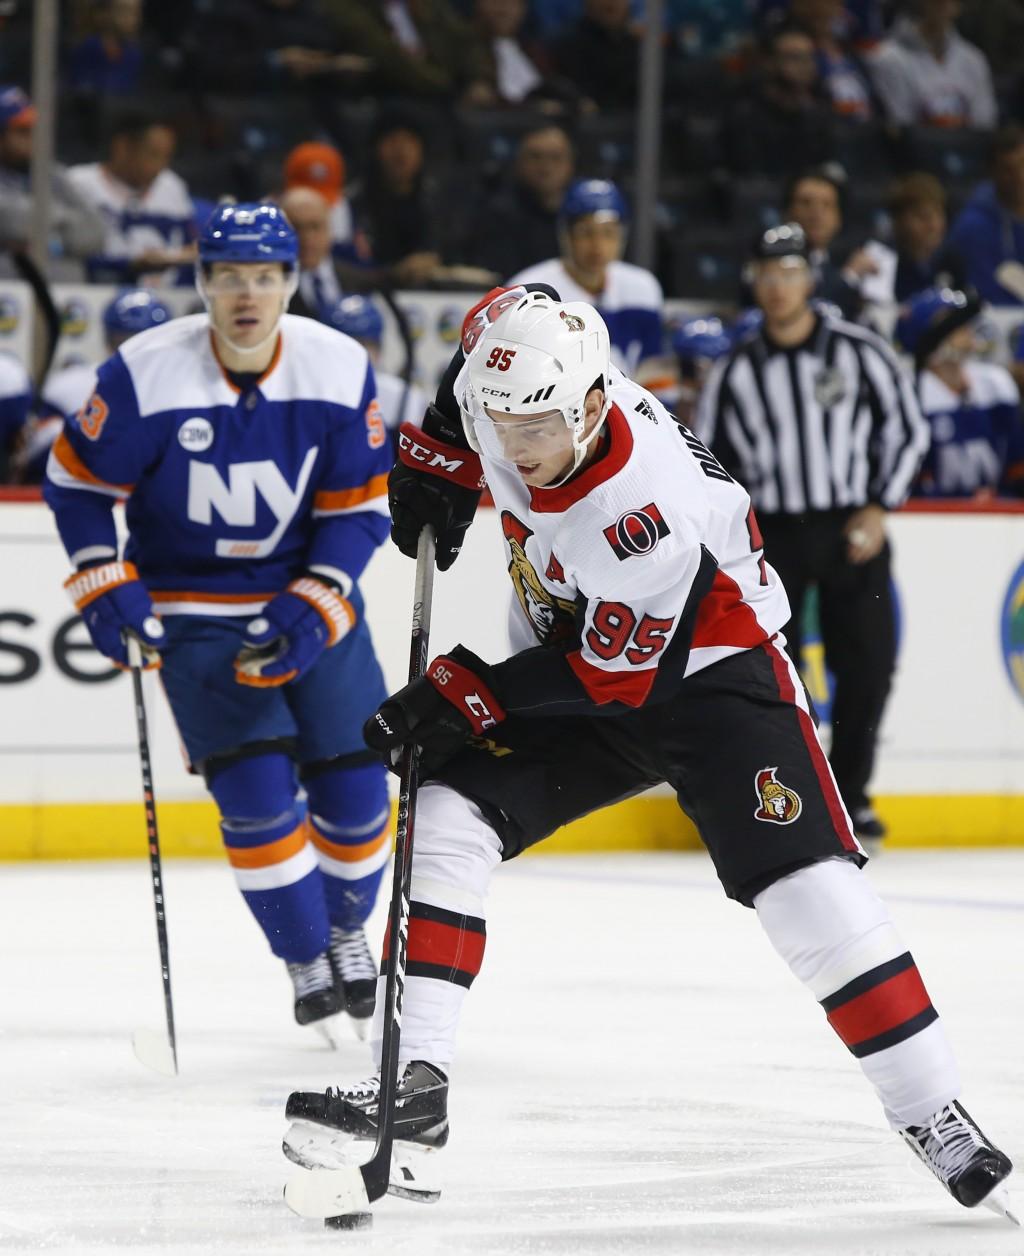 Ottawa Senators center Matt Duchene (95) plays the puck against the New York Islanders during the first period of an NHL hockey game, Friday, Dec. 28,...